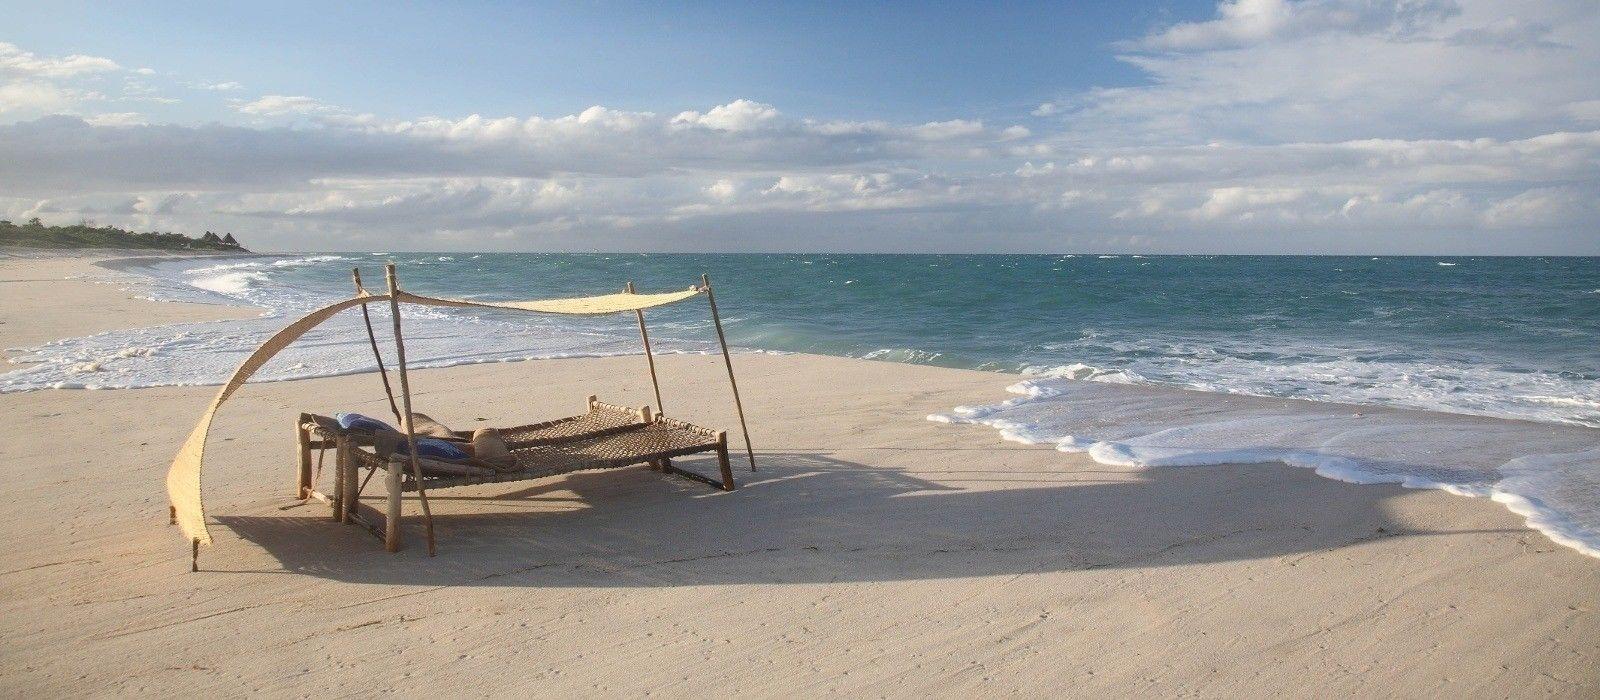 Tansania: Wahre Wildnis, unberührtes Juwel & Inselparadies Urlaub 4